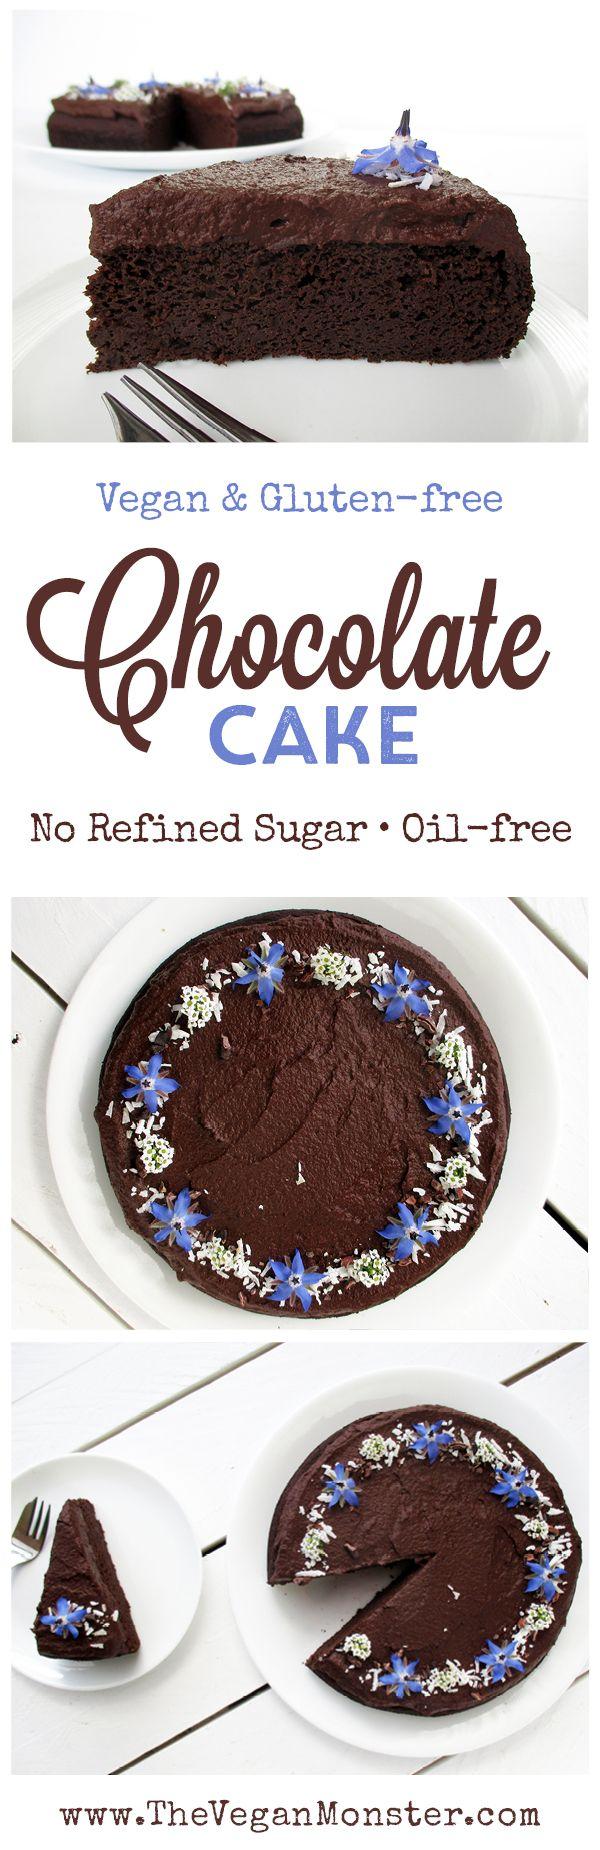 Chocolate cake. Vegan, gluten-free, oil-free.